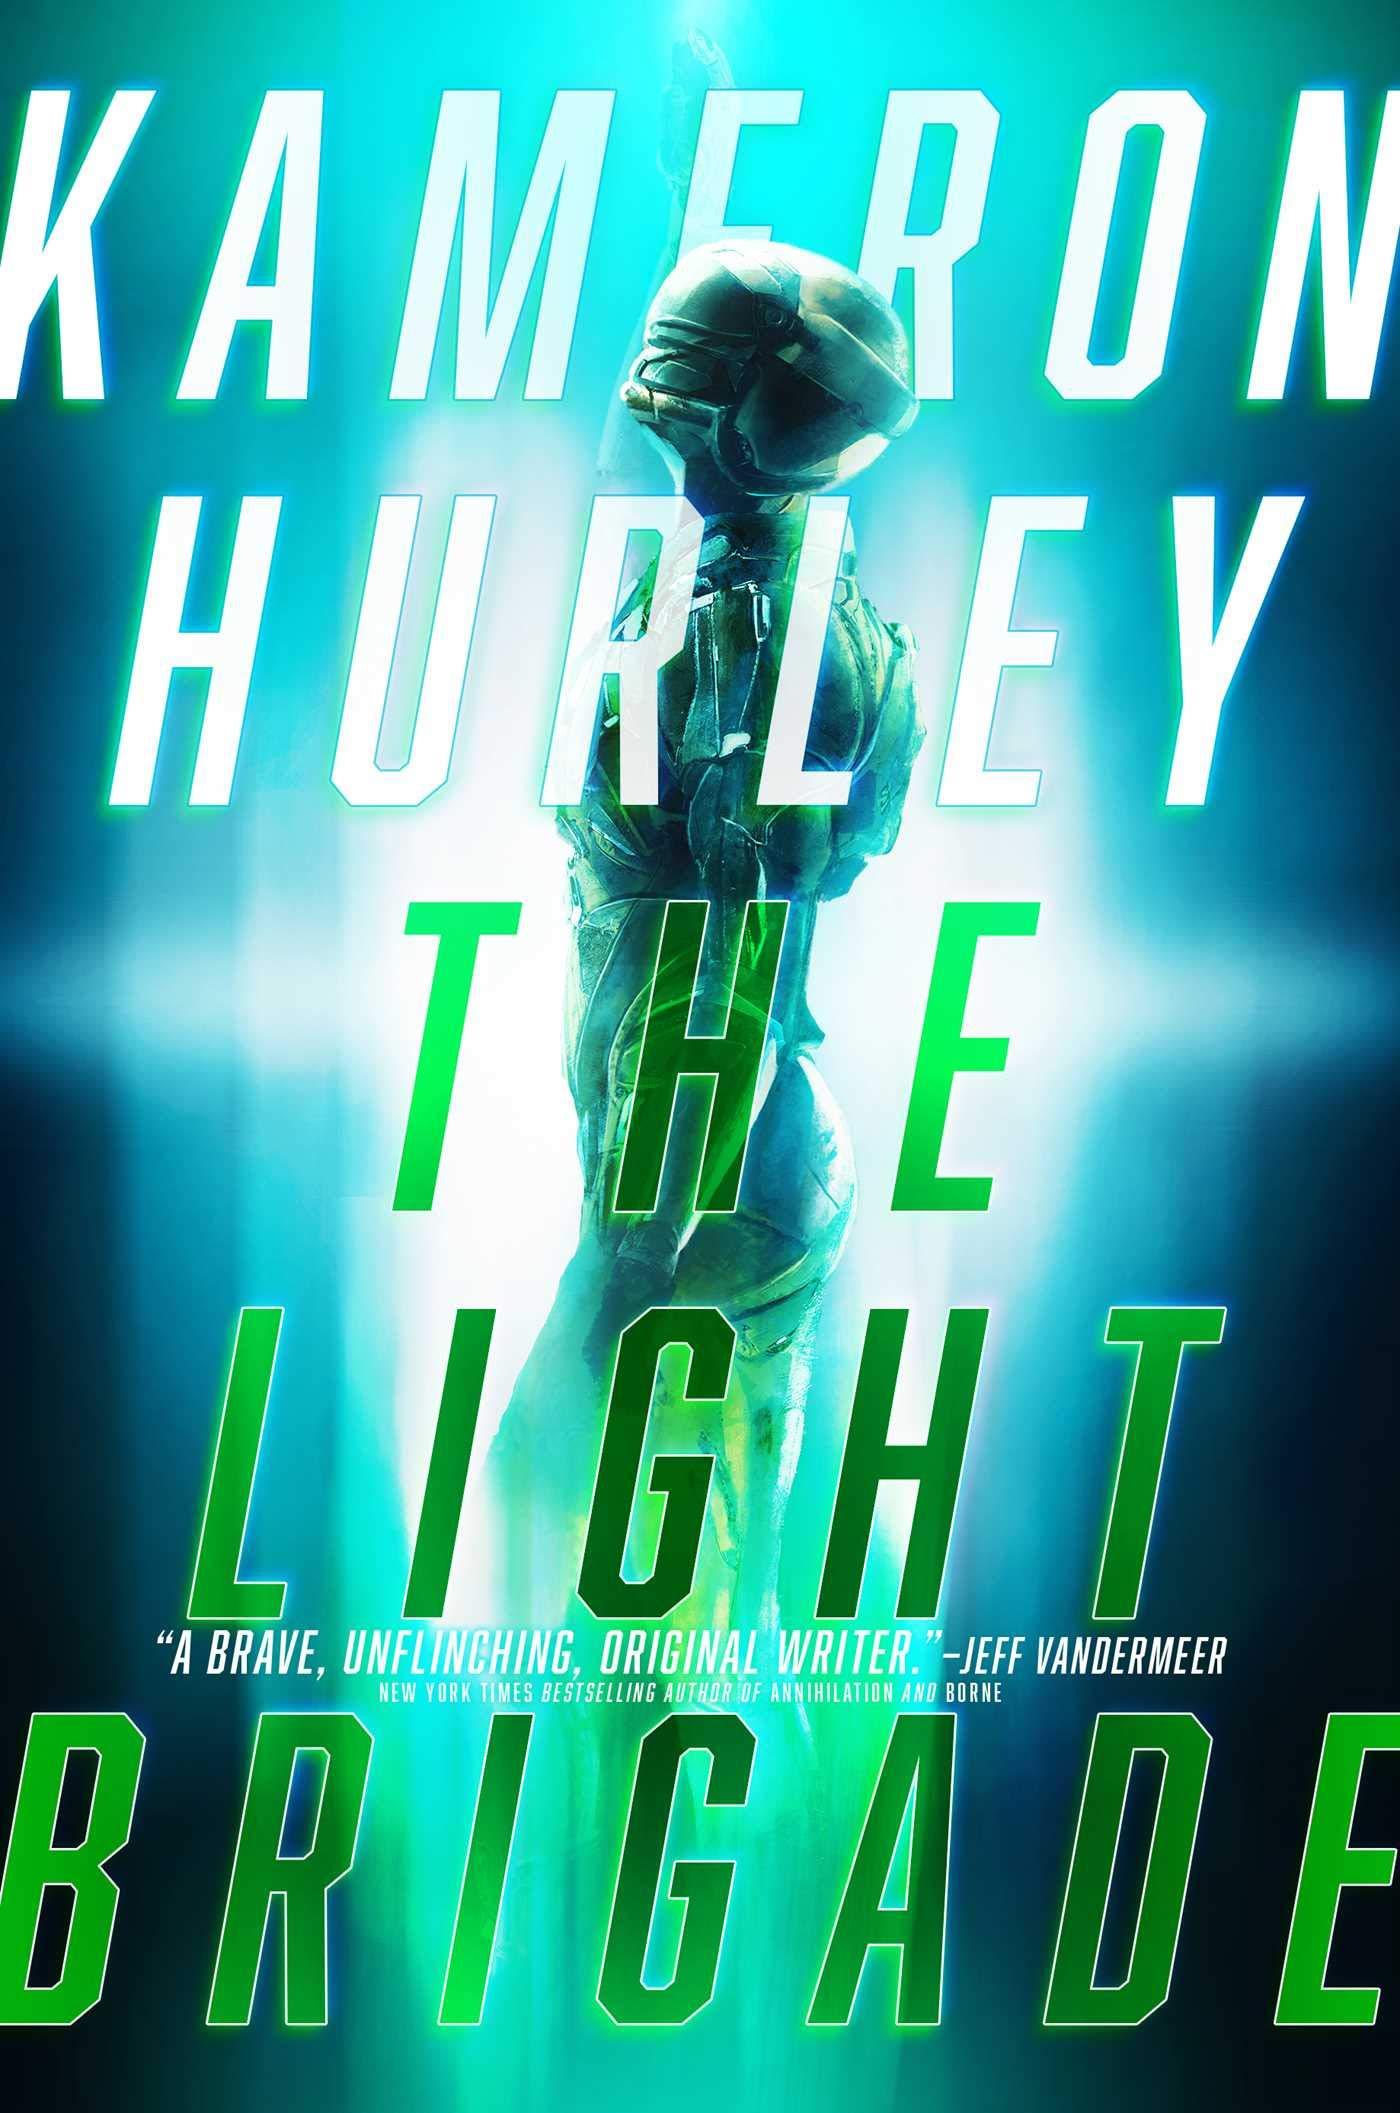 Kameron Hurley - The Light Brigade